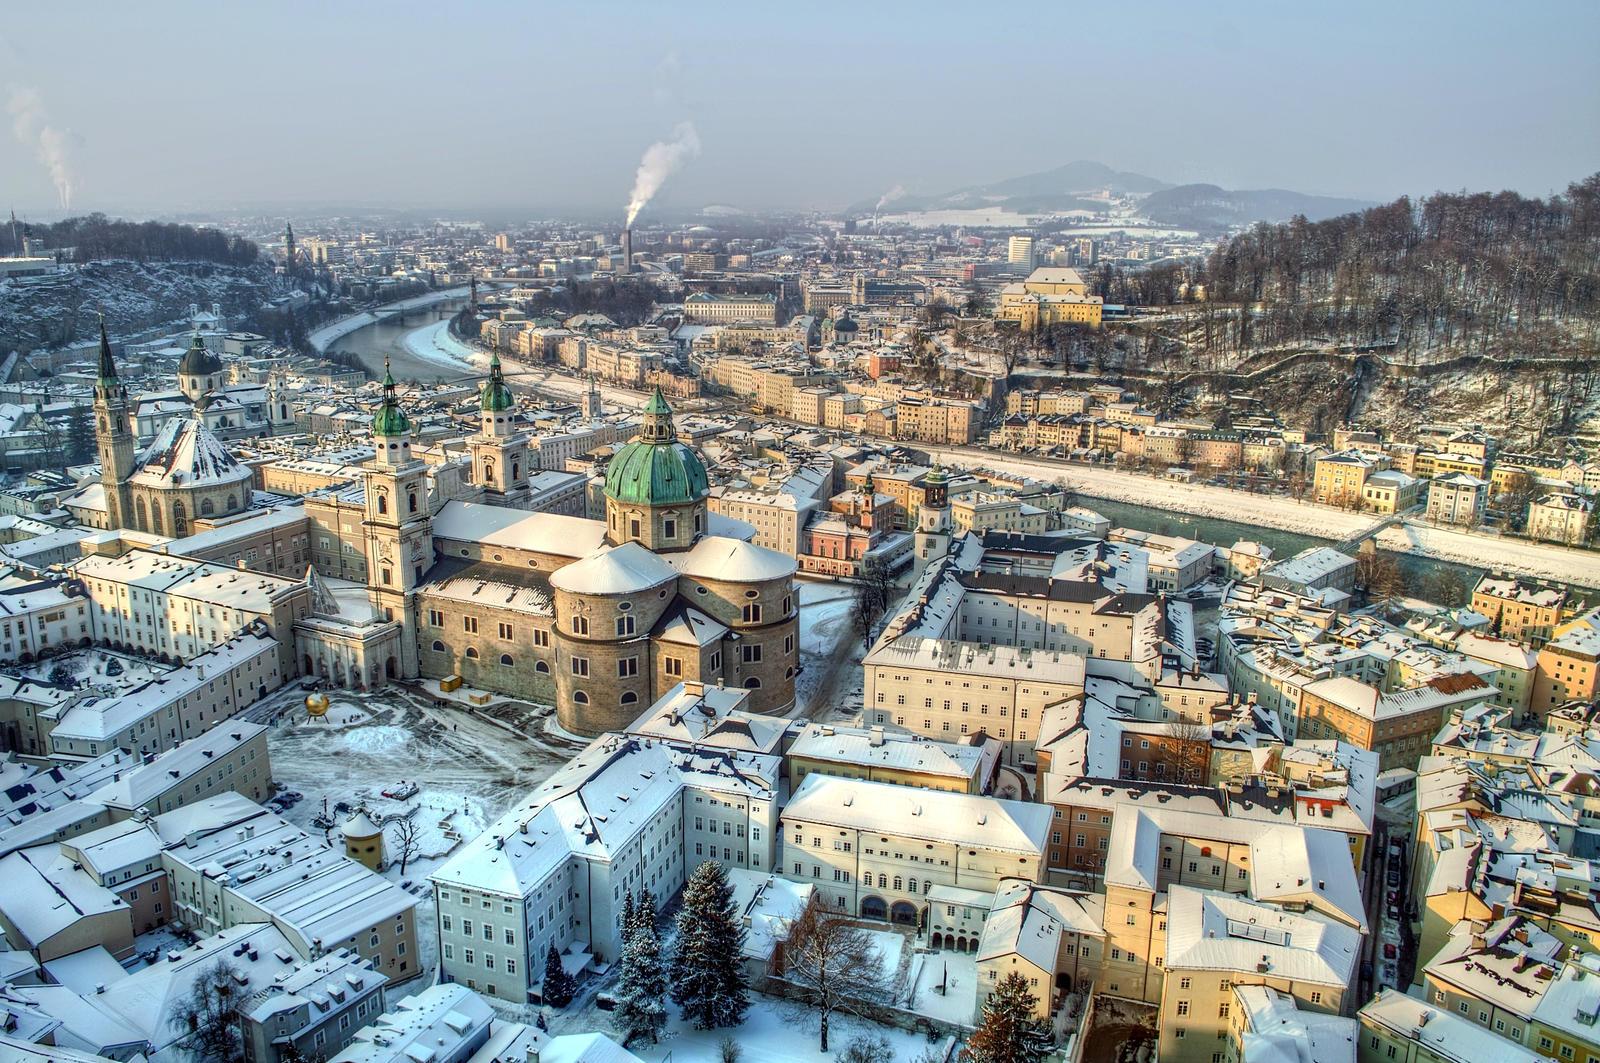 City of Salzburg by Burtn